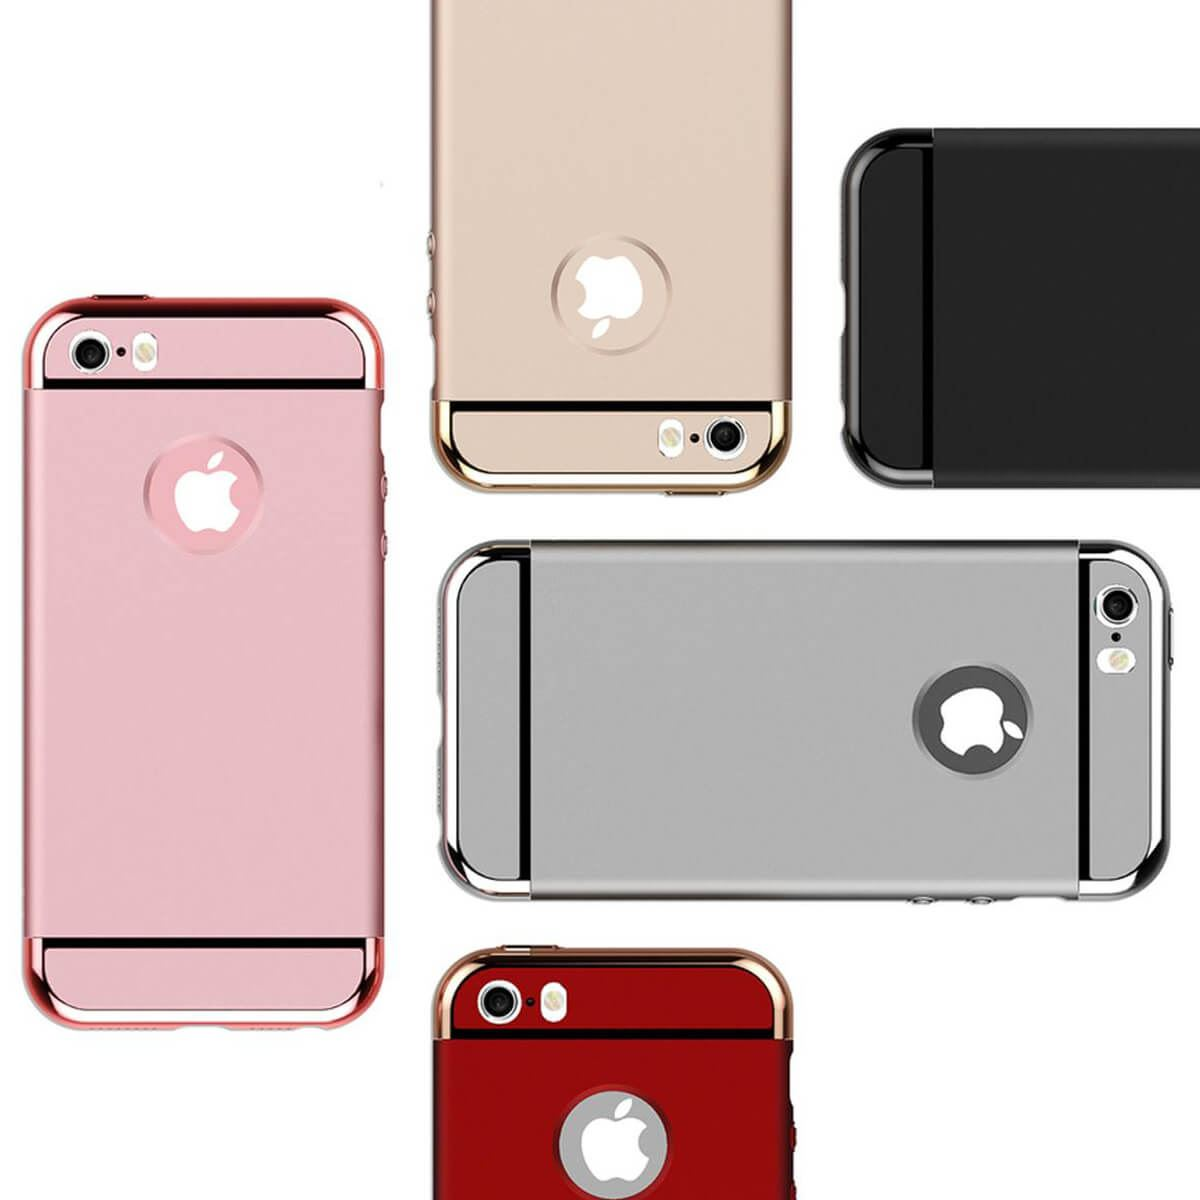 ShockProof-Thin-Case-For-Apple-iPhone-5-Se-7-6s-Plus-360-Hybrid-Matte-Slim-Cover thumbnail 25